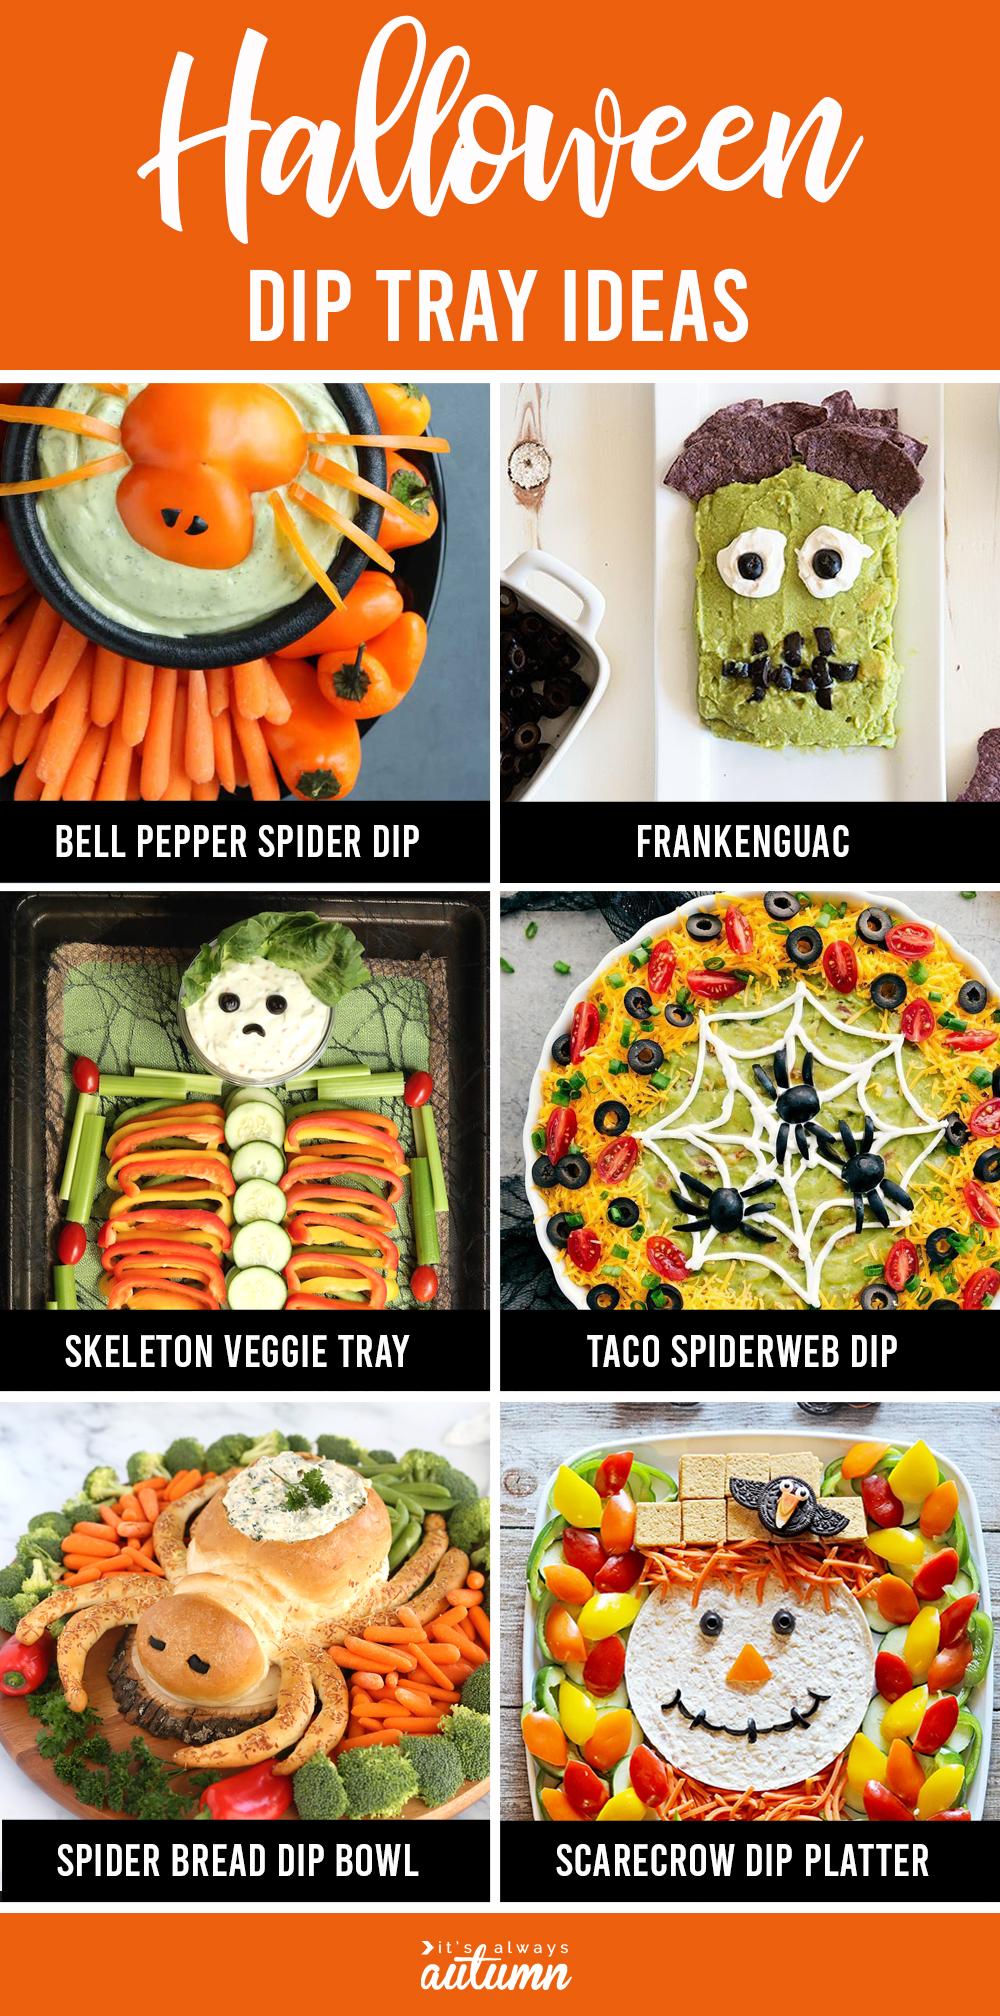 Halloween dip tray ideas